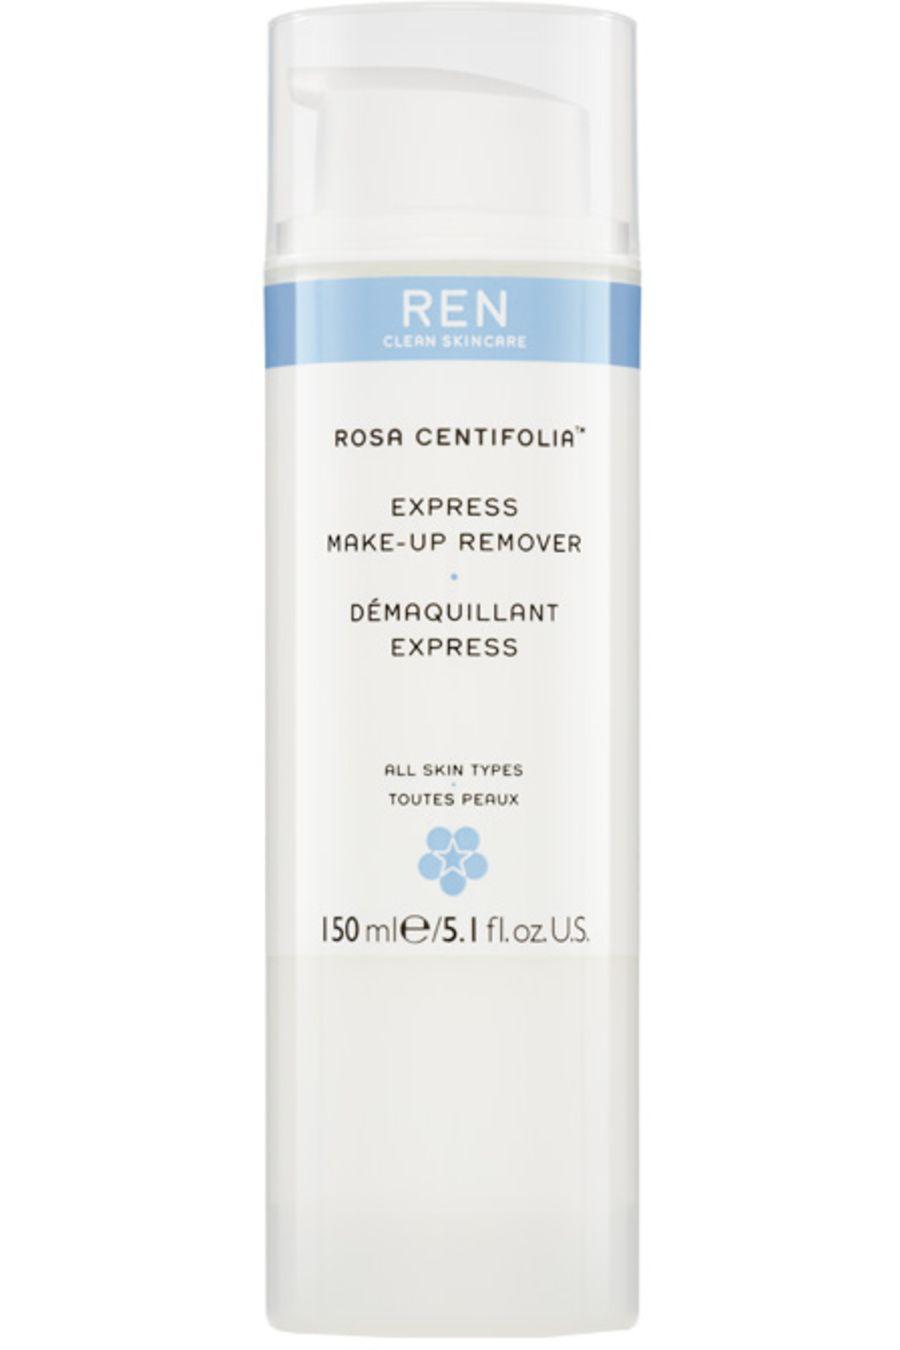 Blissim : REN - Démaquillant express Rosa Centifolia - Démaquillant express Rosa Centifolia